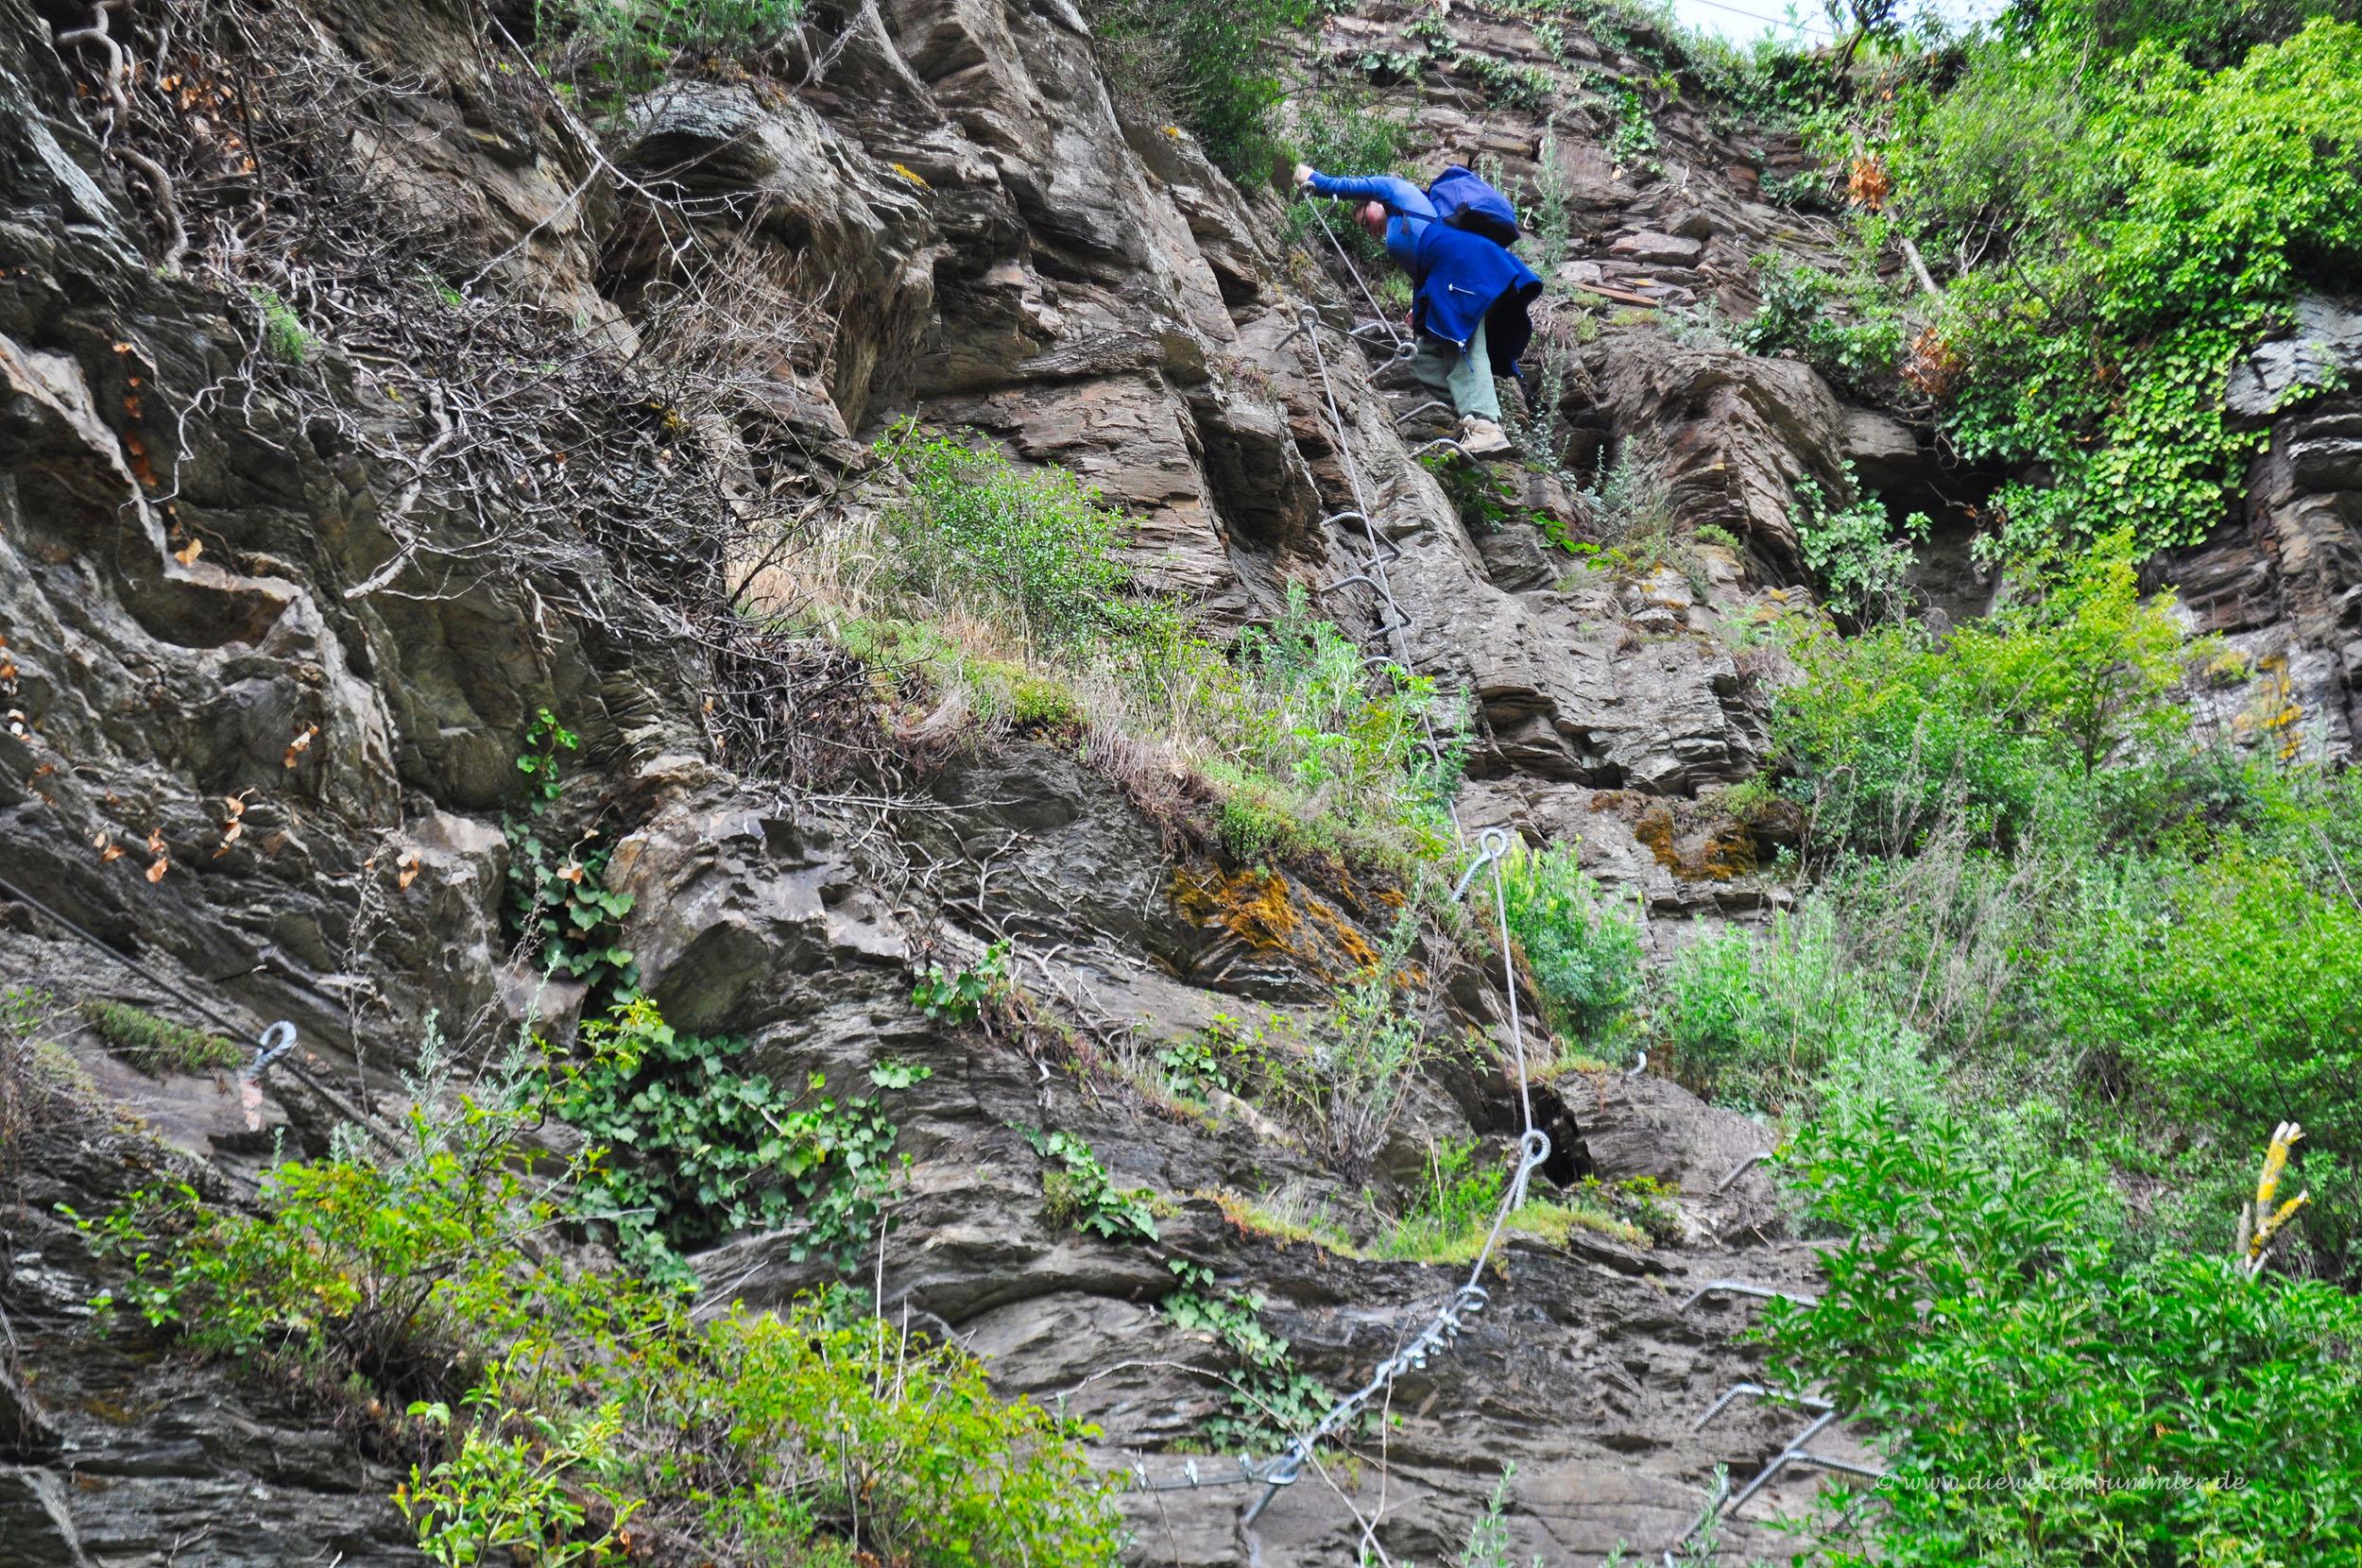 Klettersteig Mosel : Klettersteig bei zell an der mosel die weltenbummler